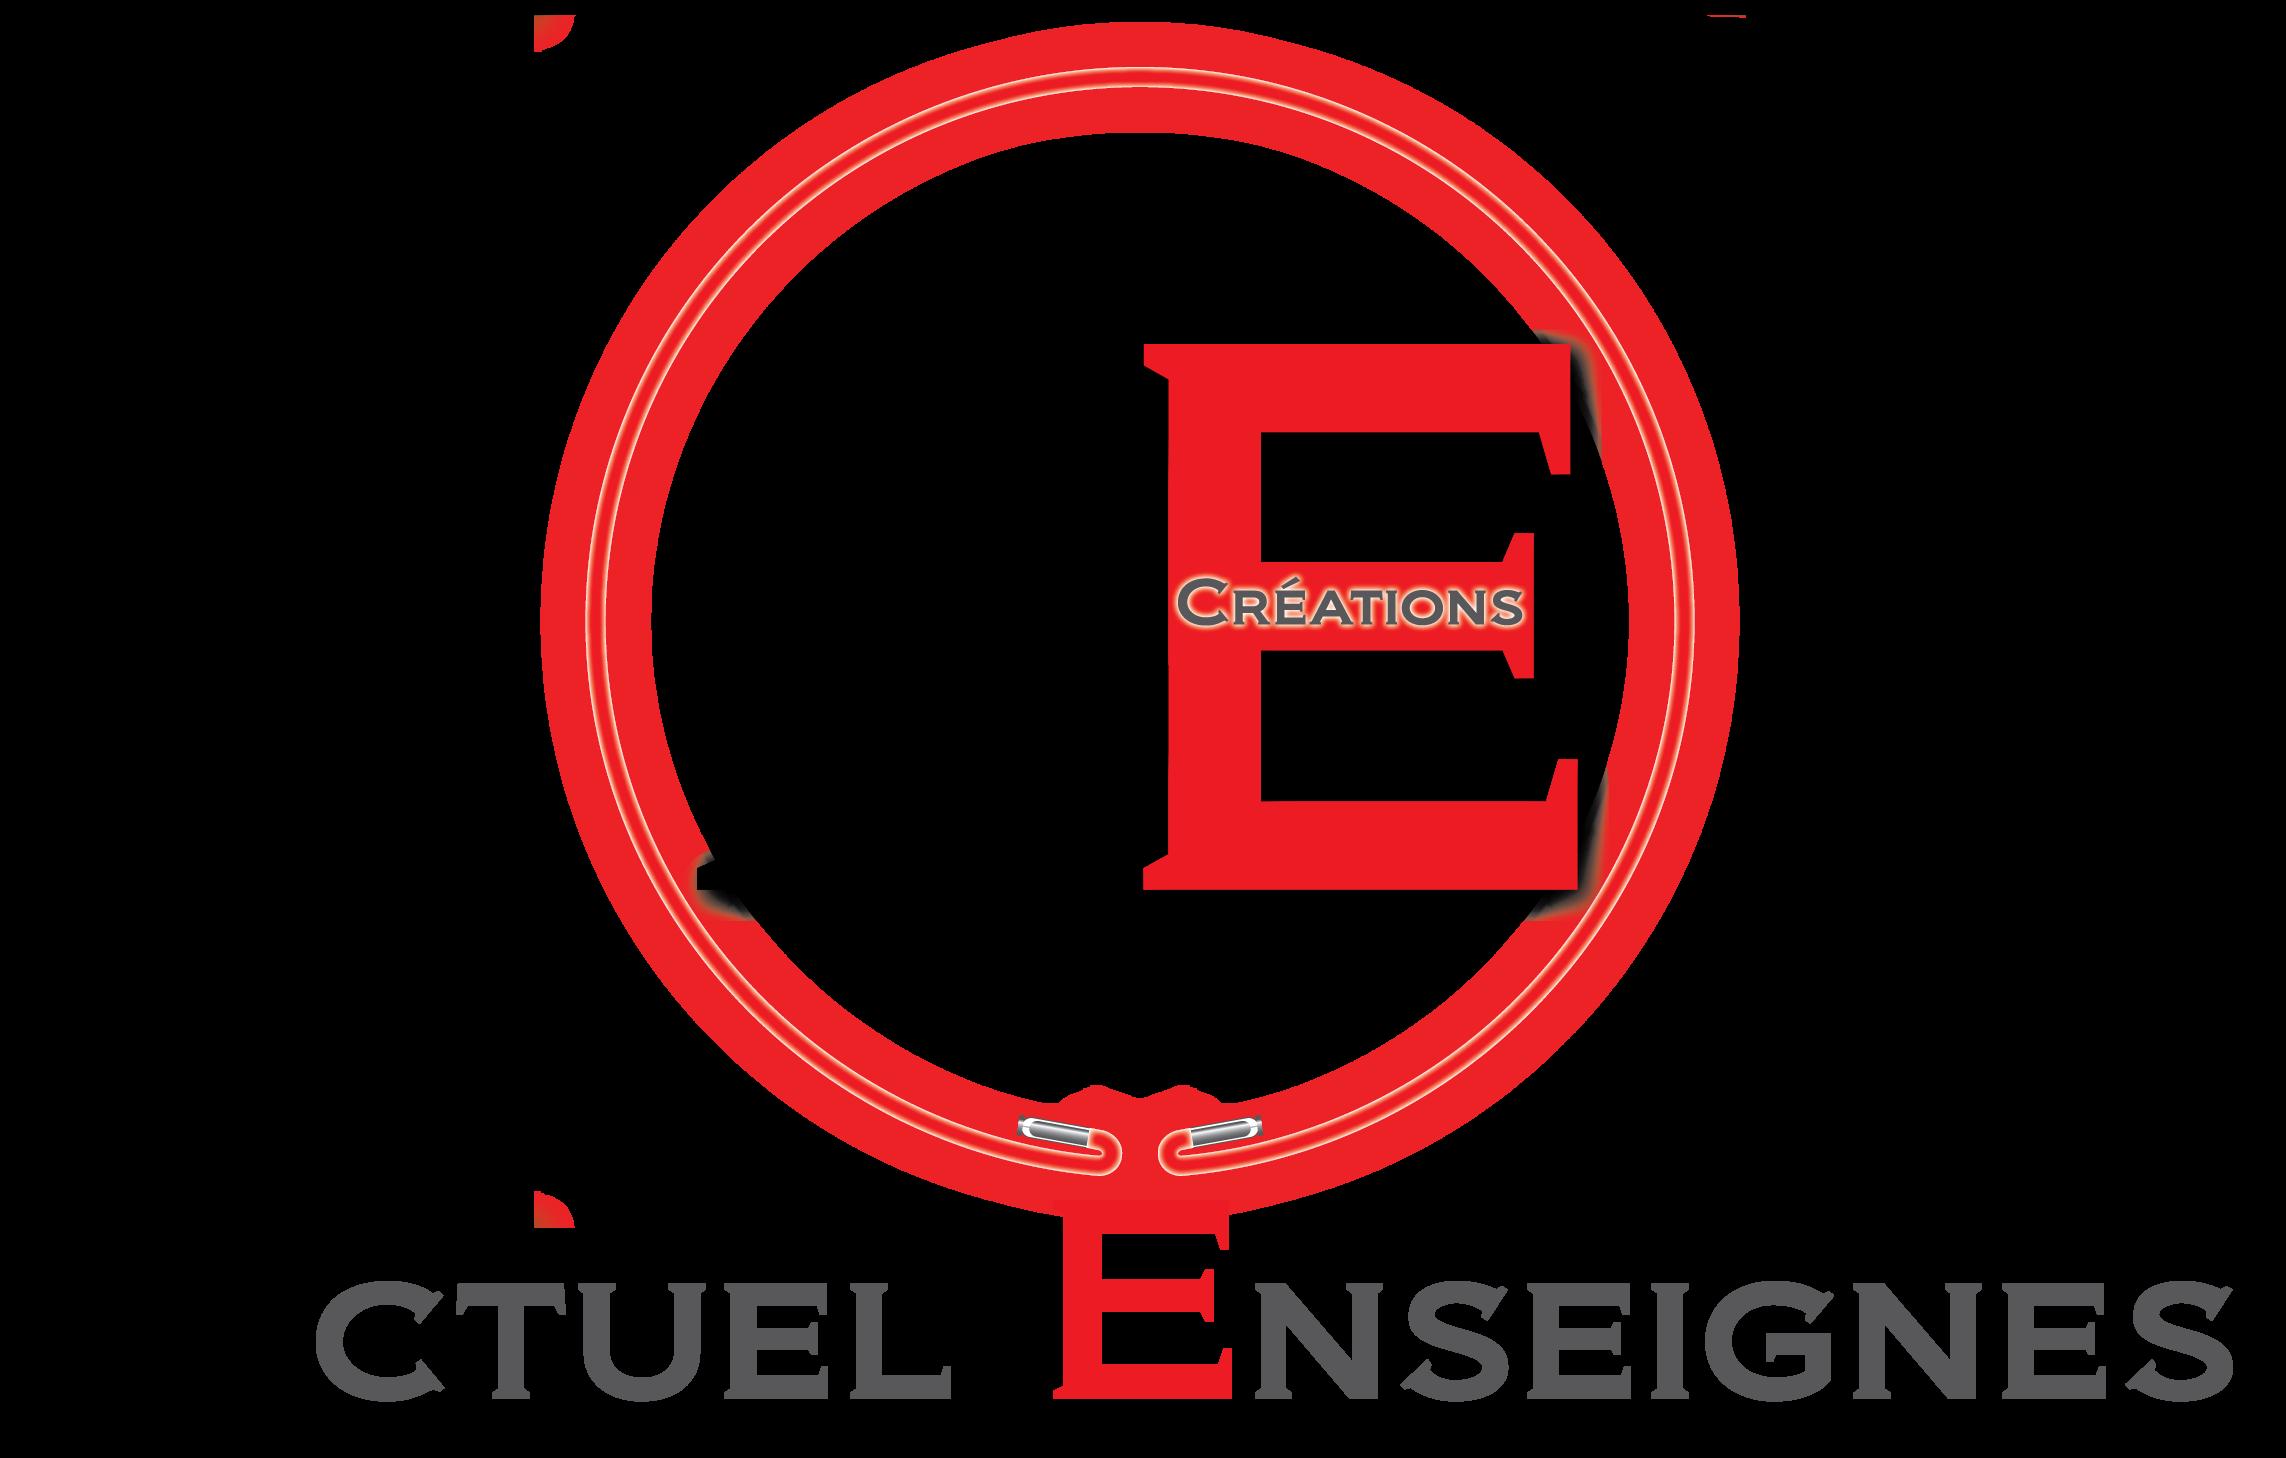 Logo actuel enseignes led neon